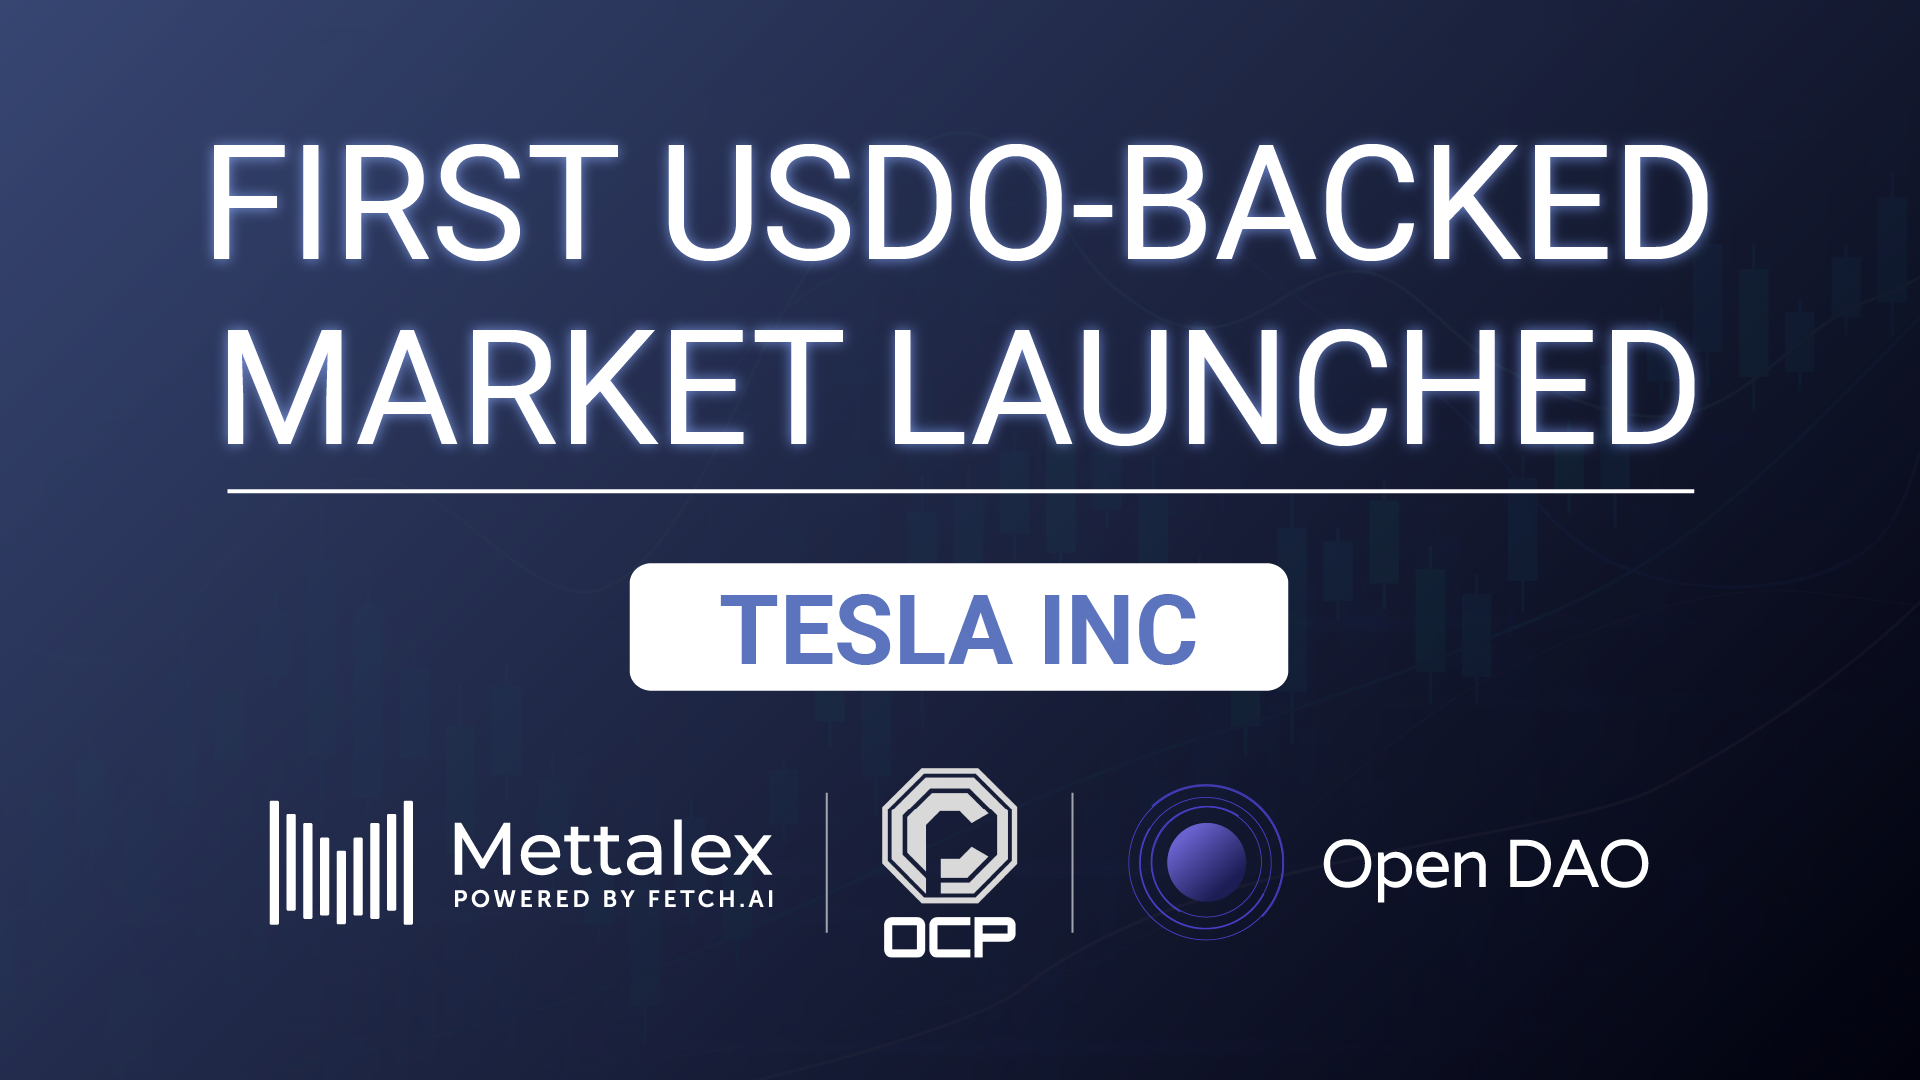 https://mettalex.com/wp-content/uploads/First-USDO-Backed-Market-on-Mettalex-DEX-1.png